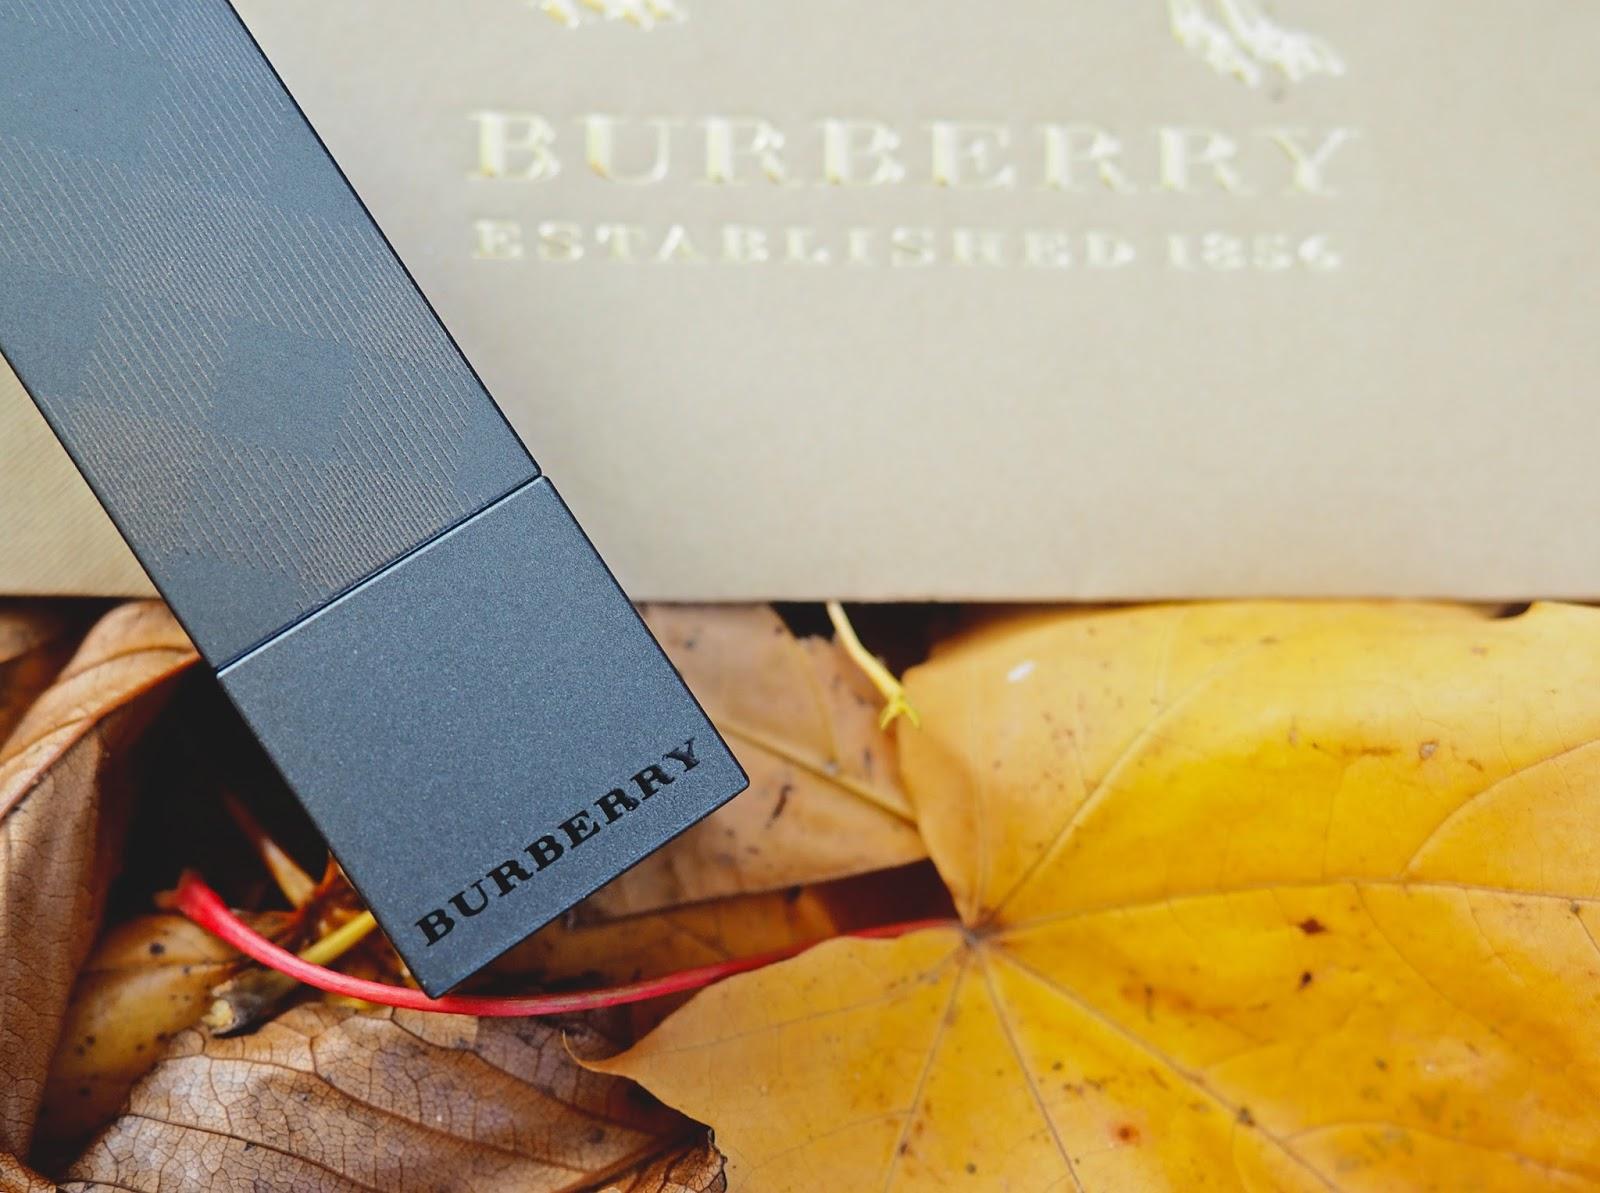 Burberry Lip Velvet Oxblood Review Swatch